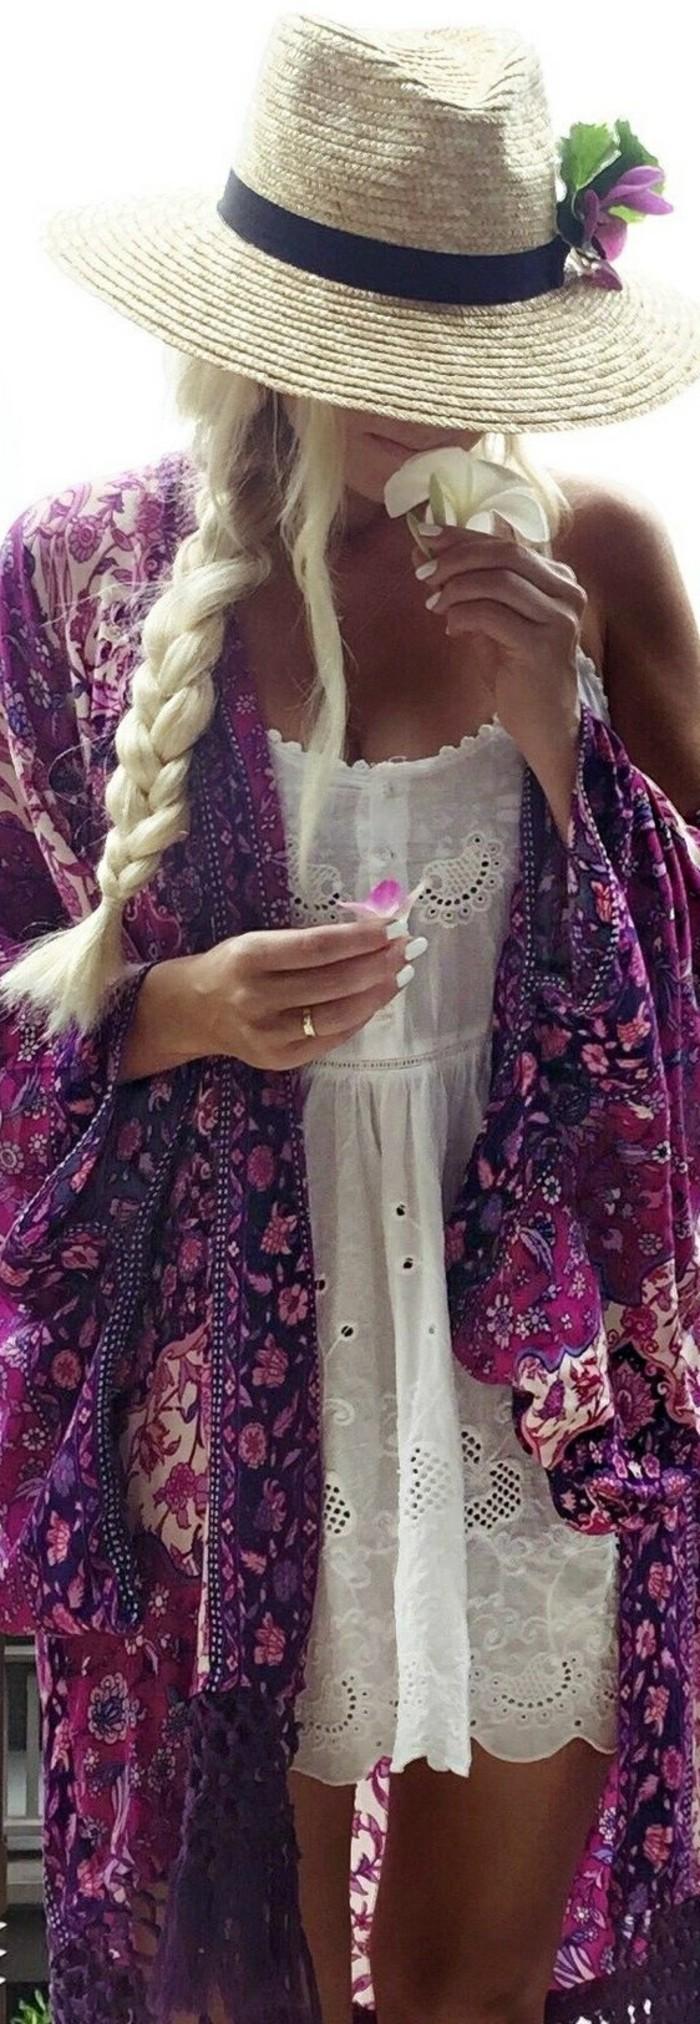 La veste kimono - de la tradition à la modernité